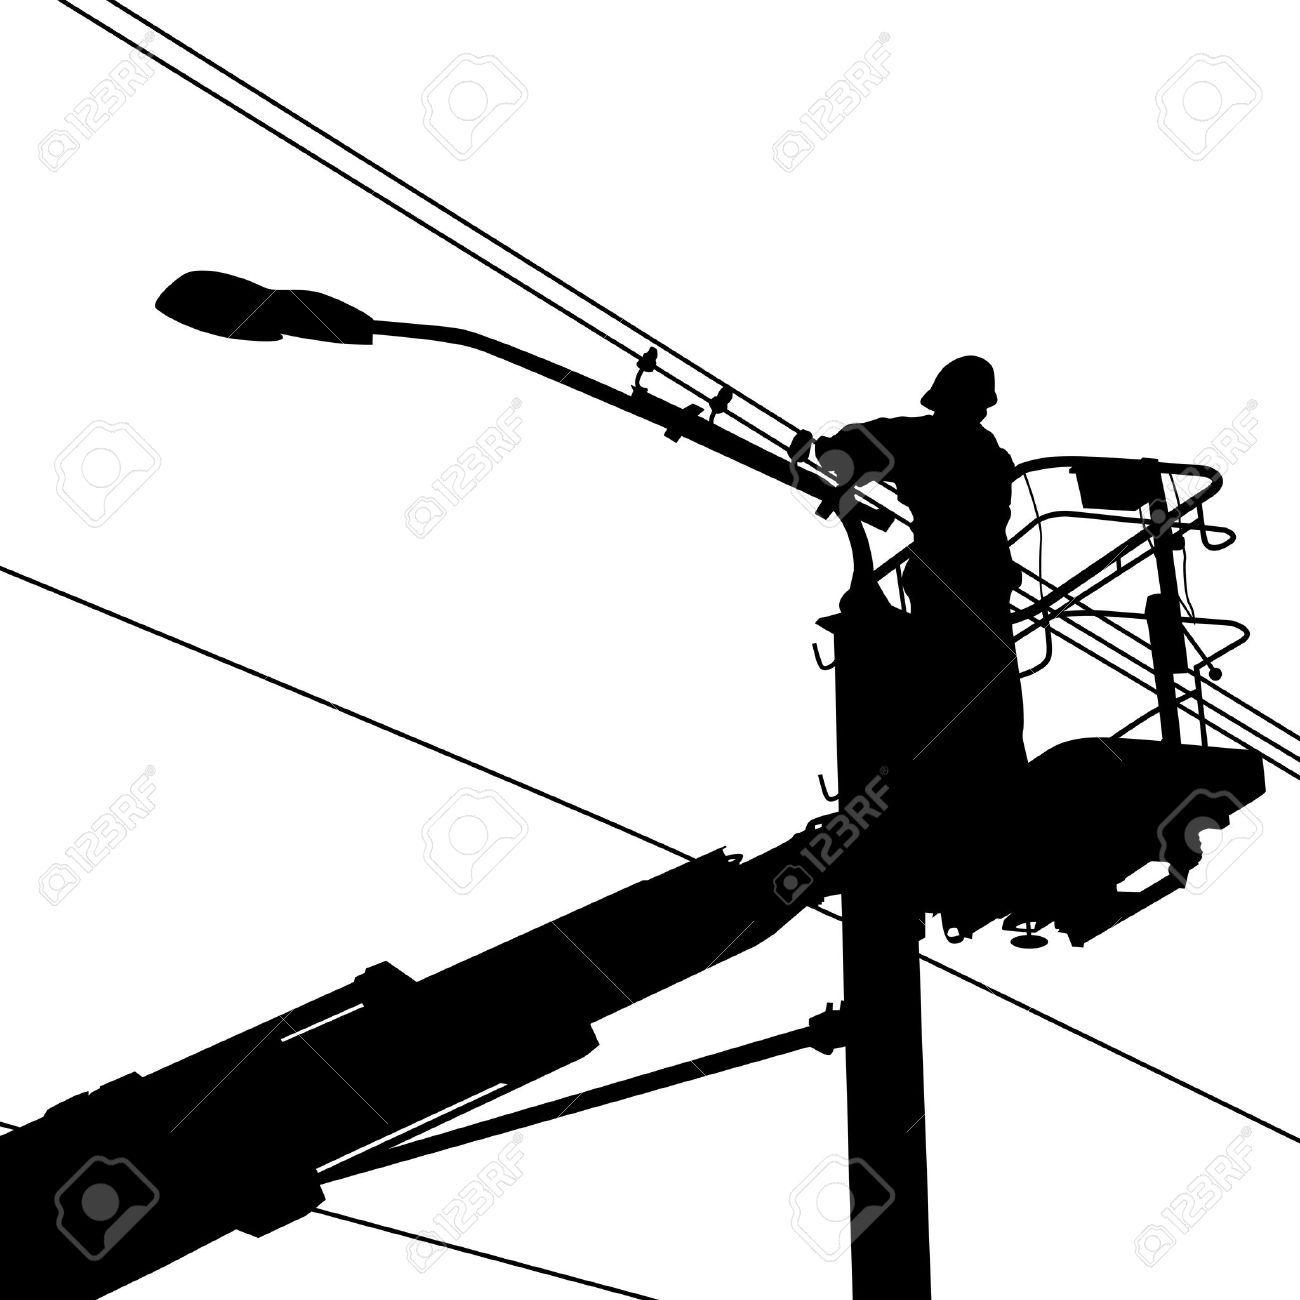 Electric Clipart Electric Pole - Electric Pole Clipart, HD Png Download -  kindpng